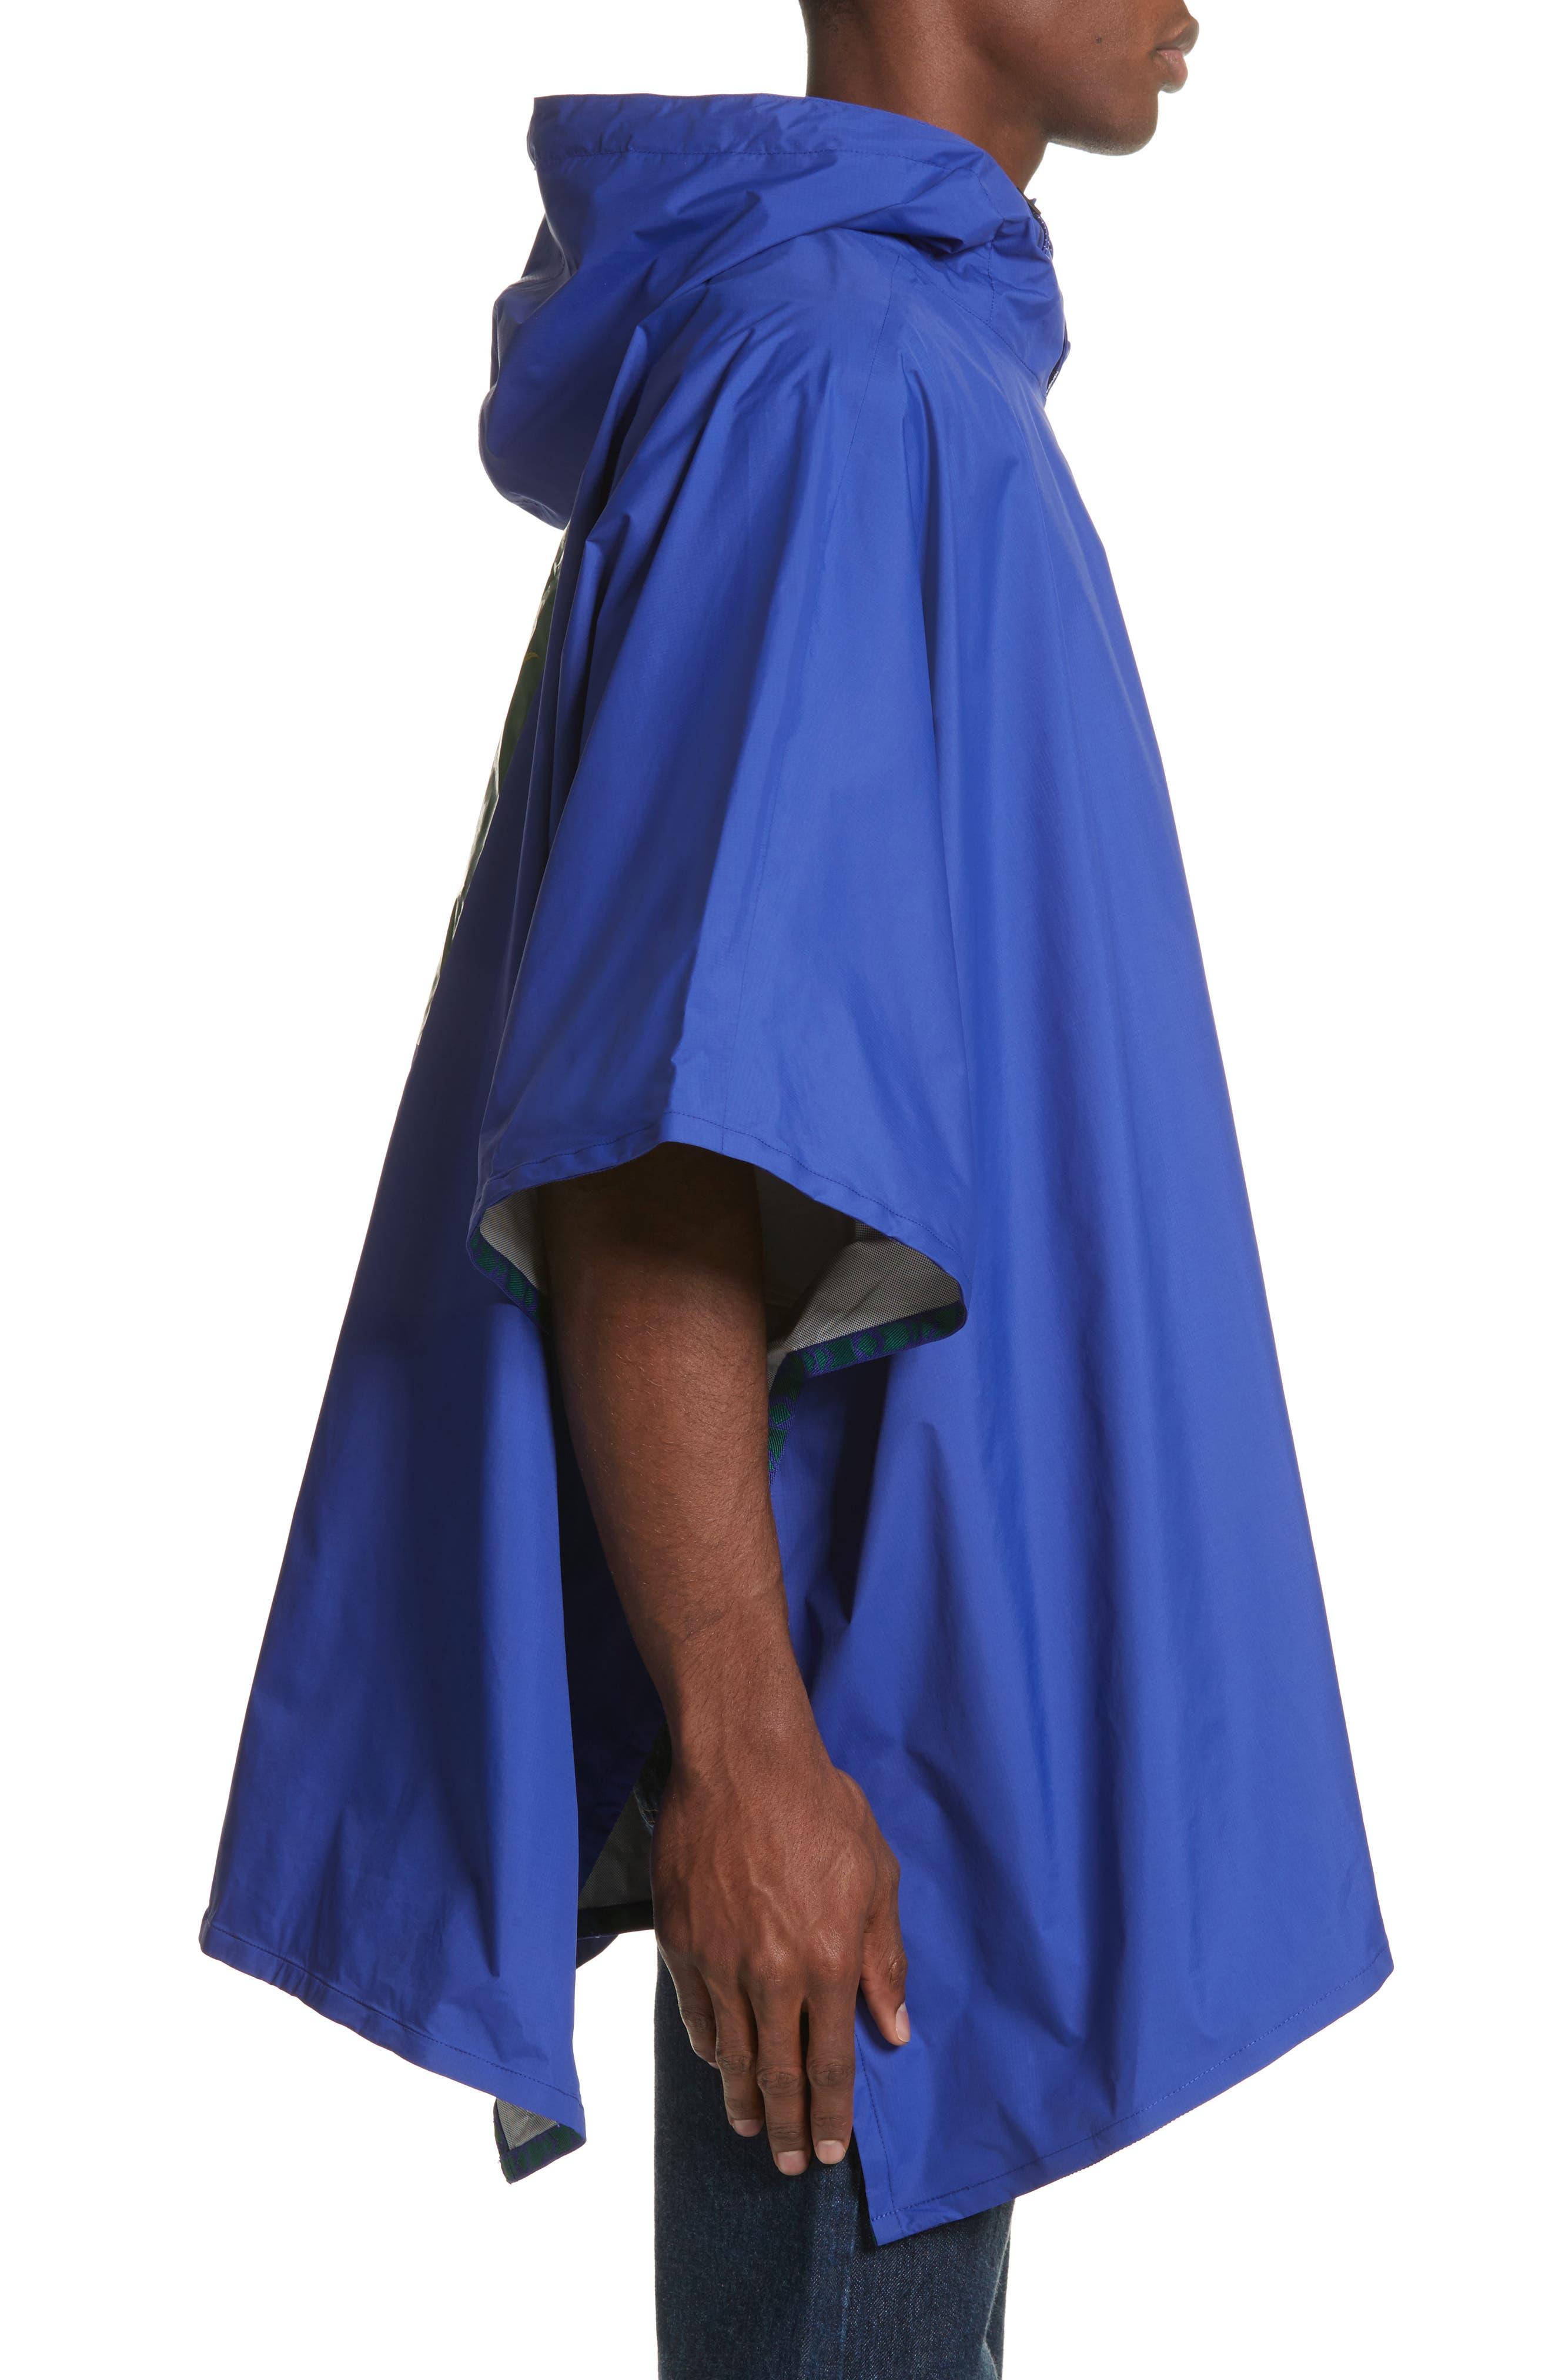 Unisex Rain Poncho,                             Alternate thumbnail 9, color,                             Lapis Blue